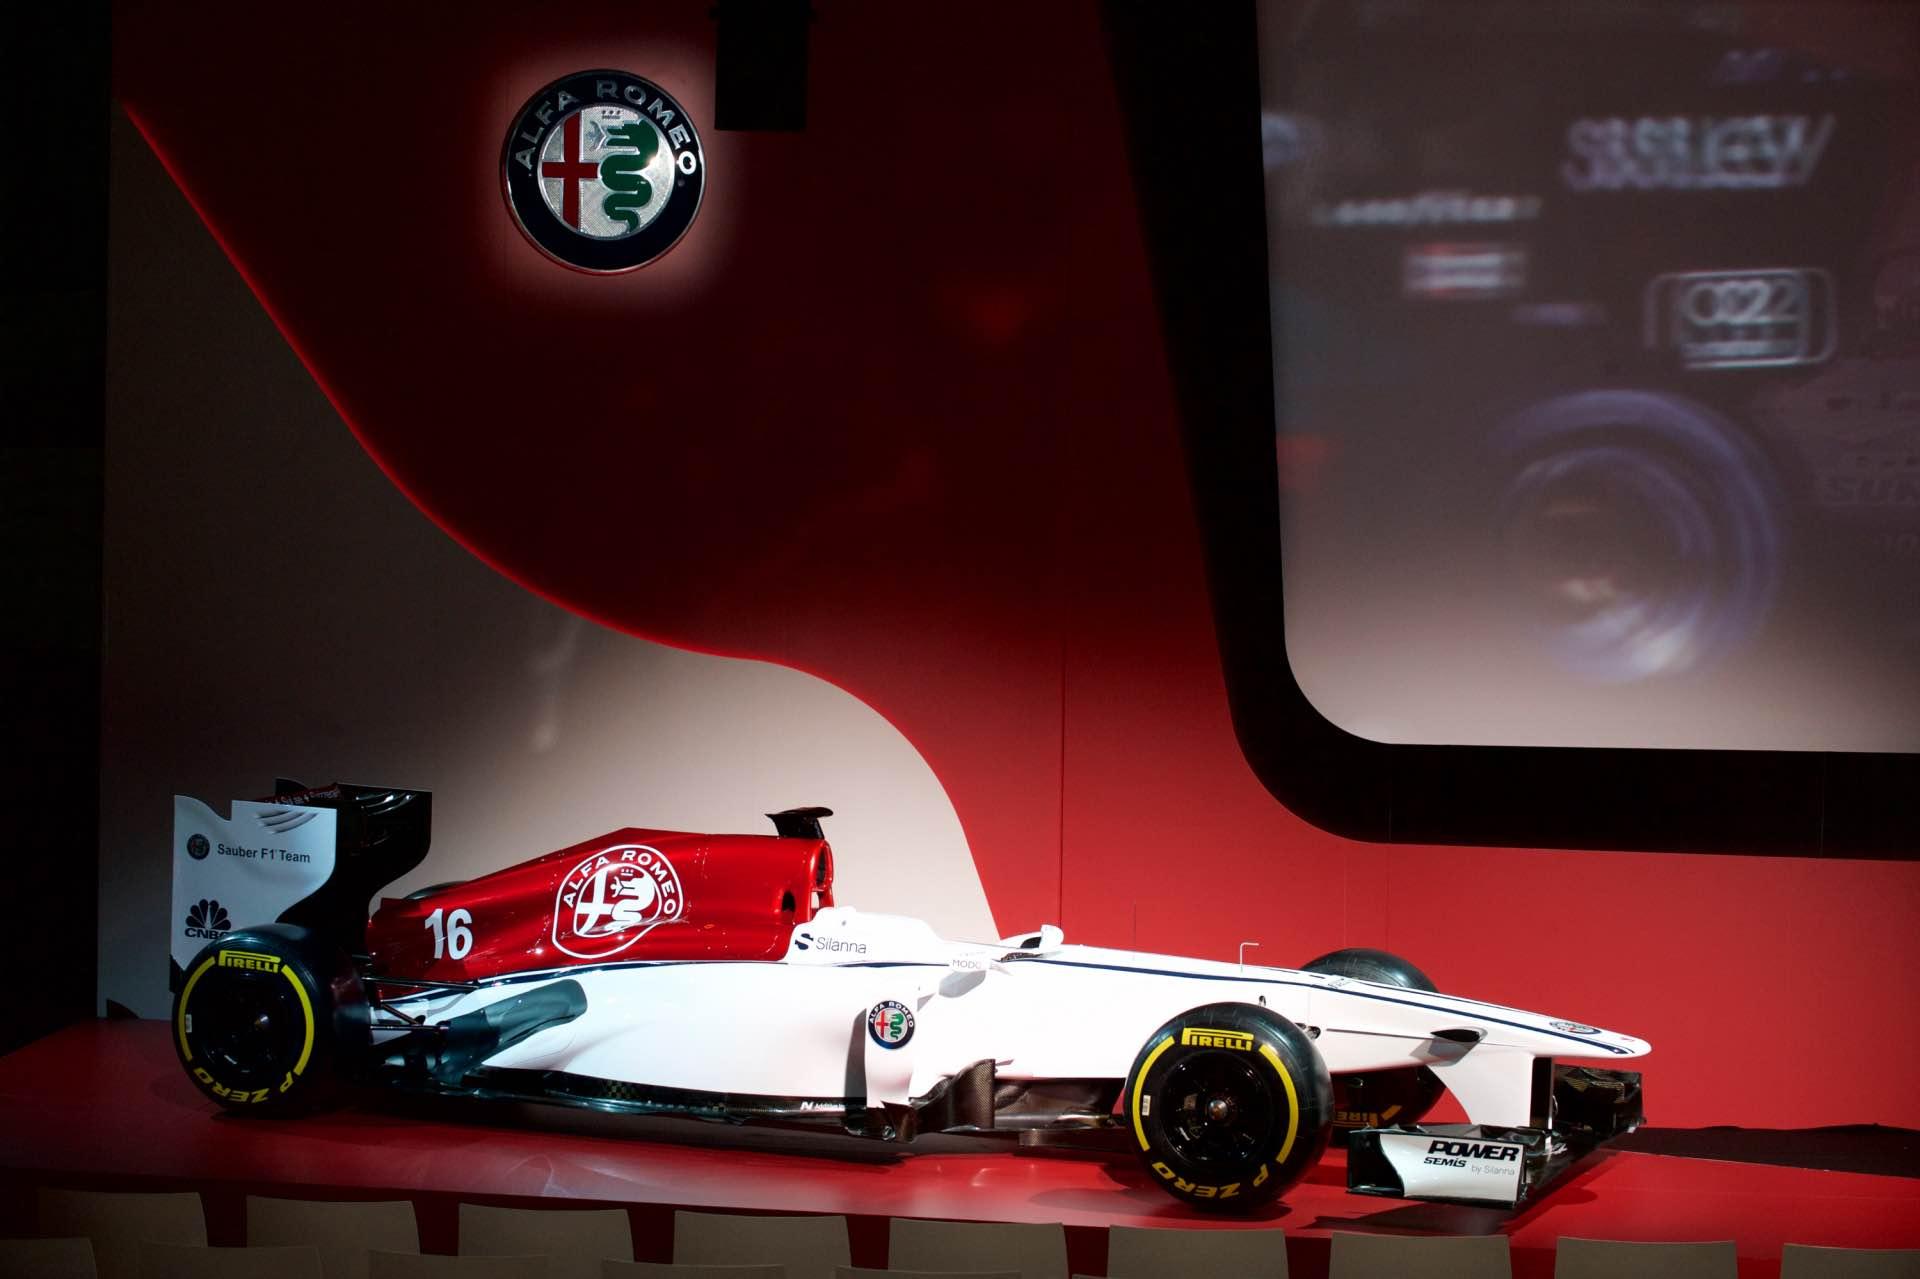 171202_Alfa-Romeo_Team-F1_01